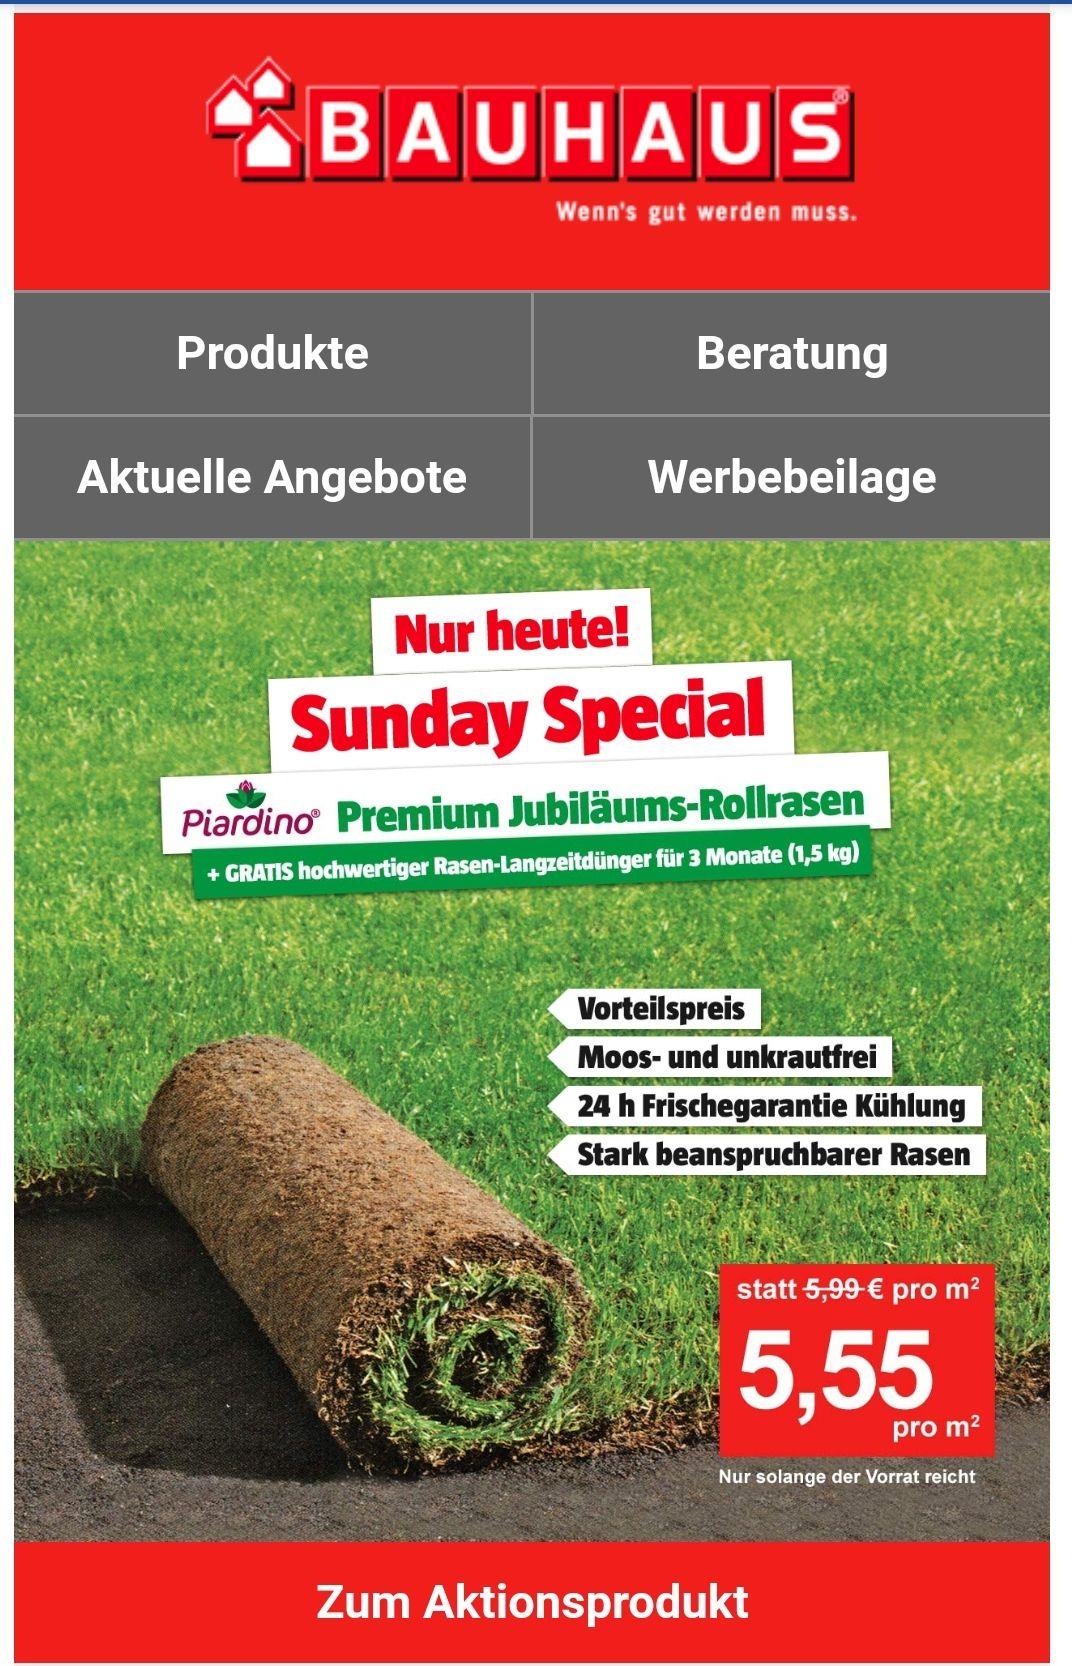 Piardino Premium Jubiläums-Rollrasen 50qm - inkl. gratis Rasen-Langzeitdünger 1,5 kg